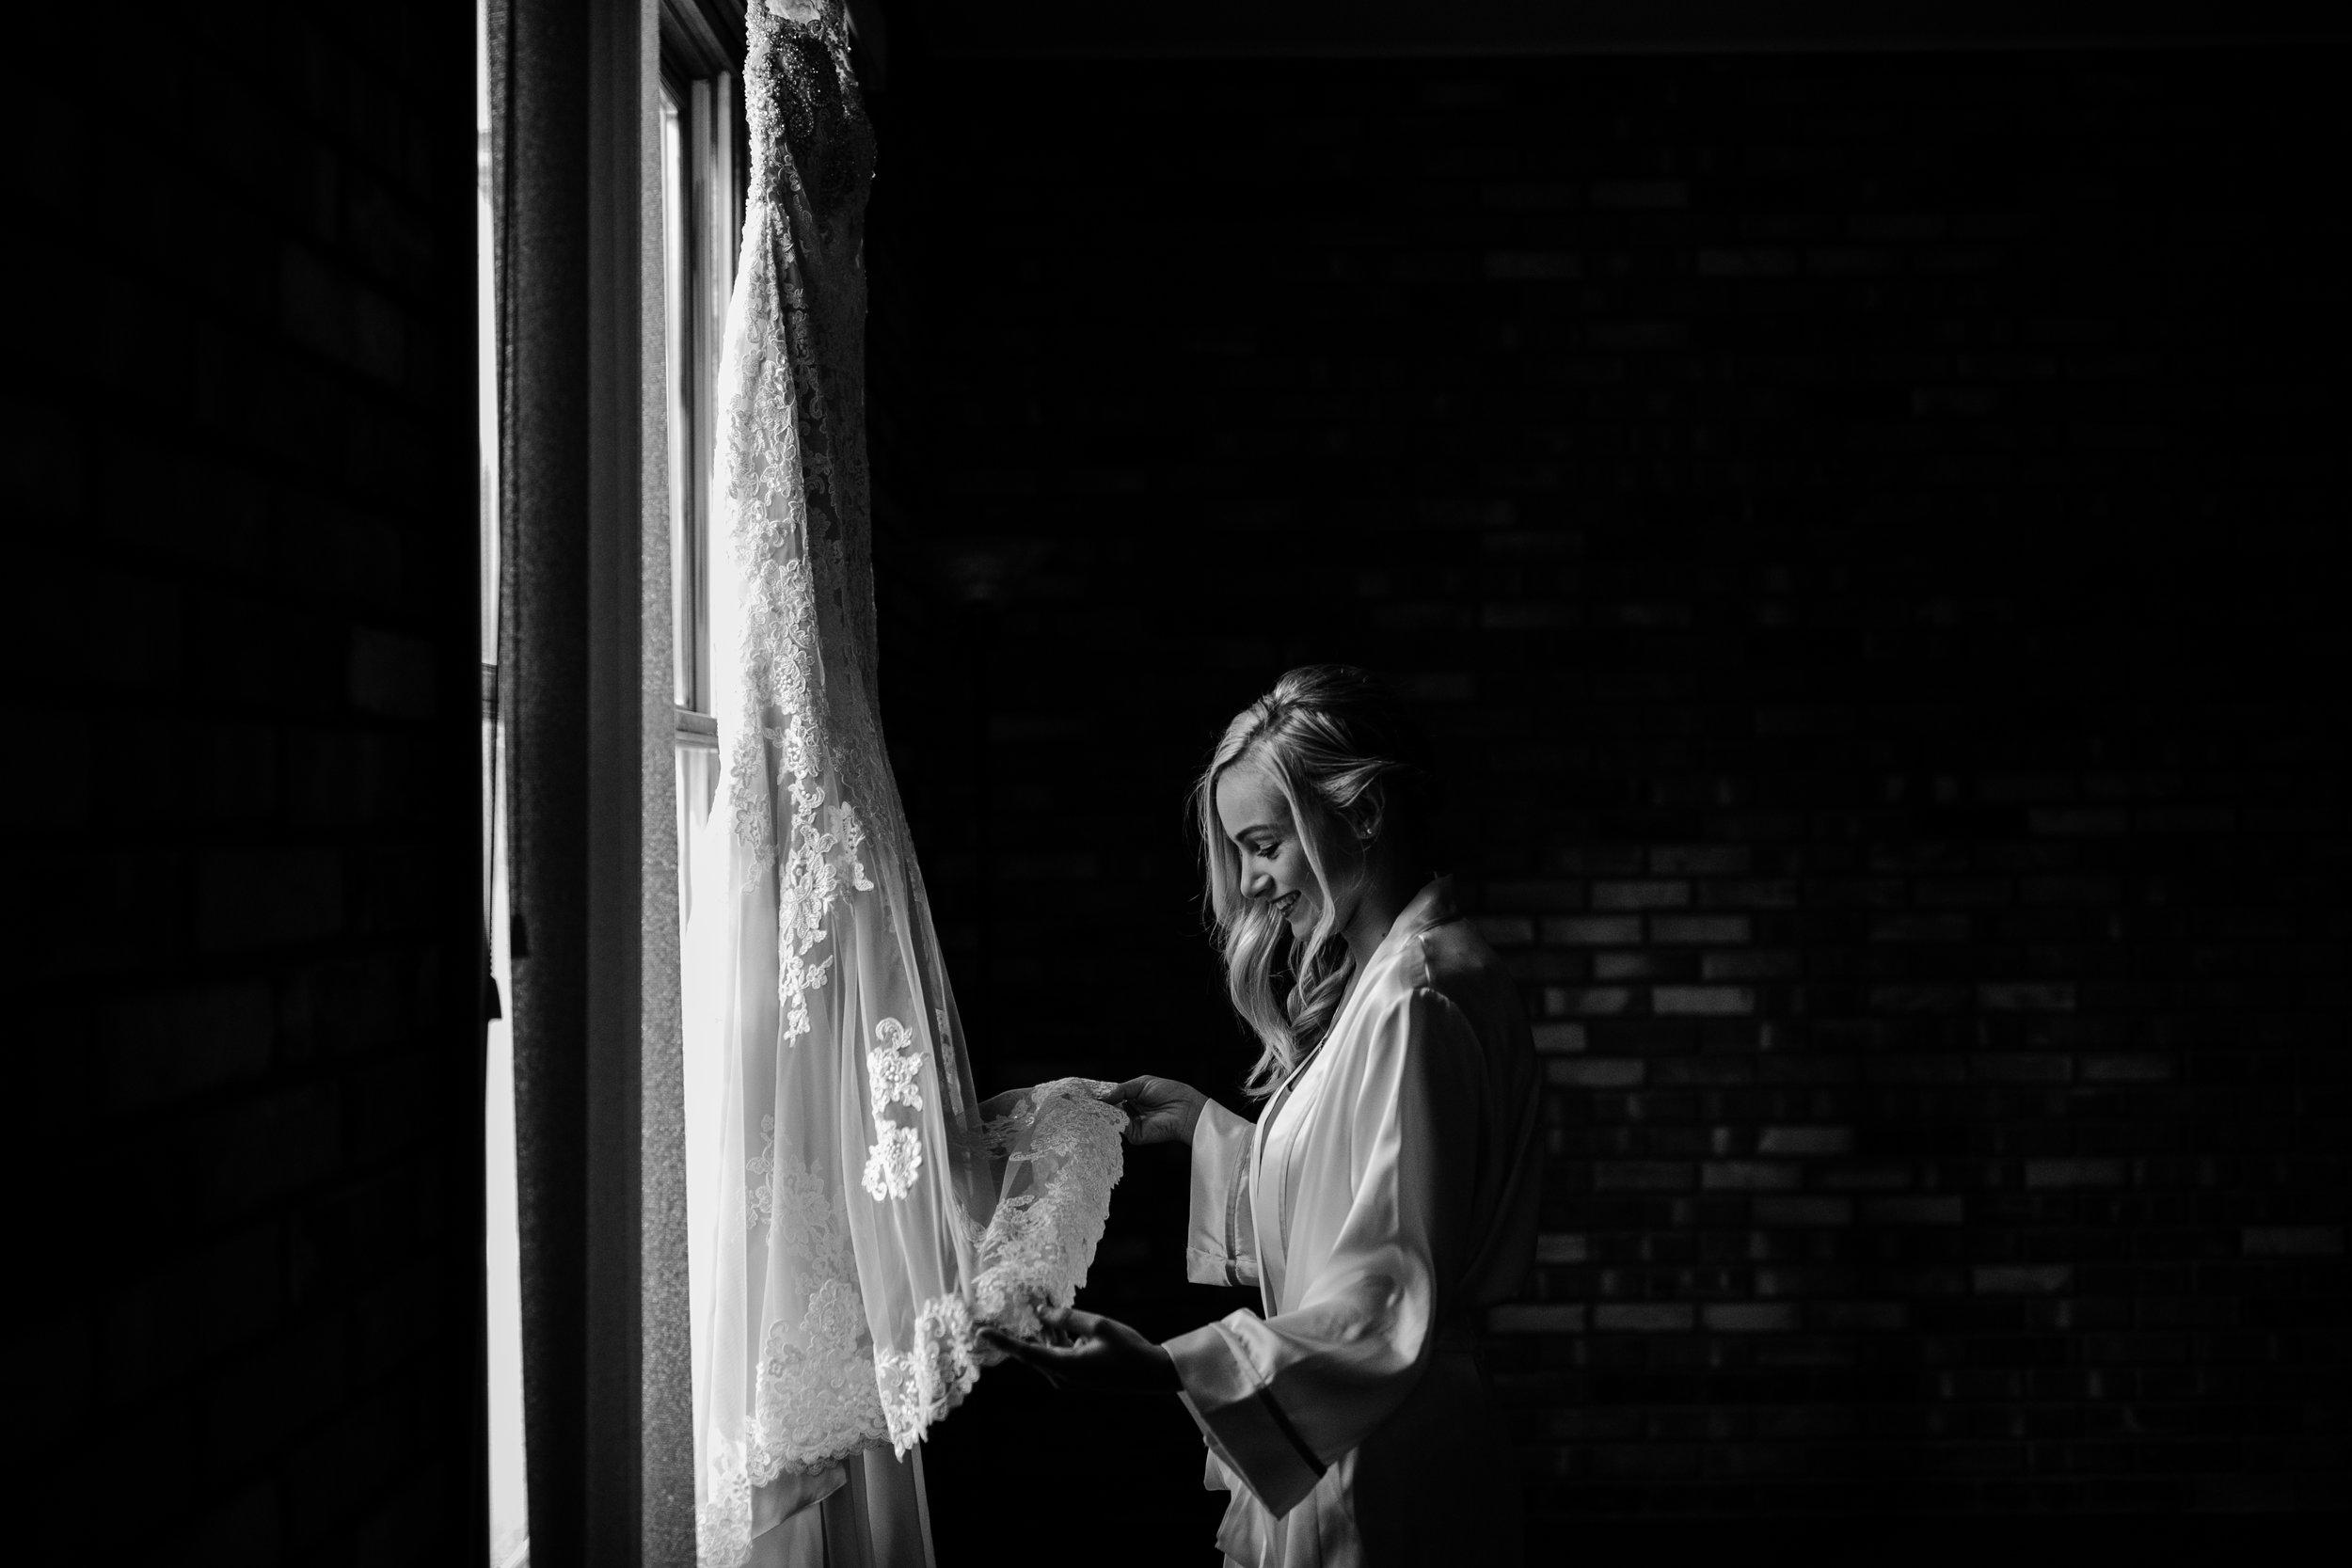 west-michigan-wedding-photographer-whitehall-rachel-austin-chapel-in-the-pines-122.jpg